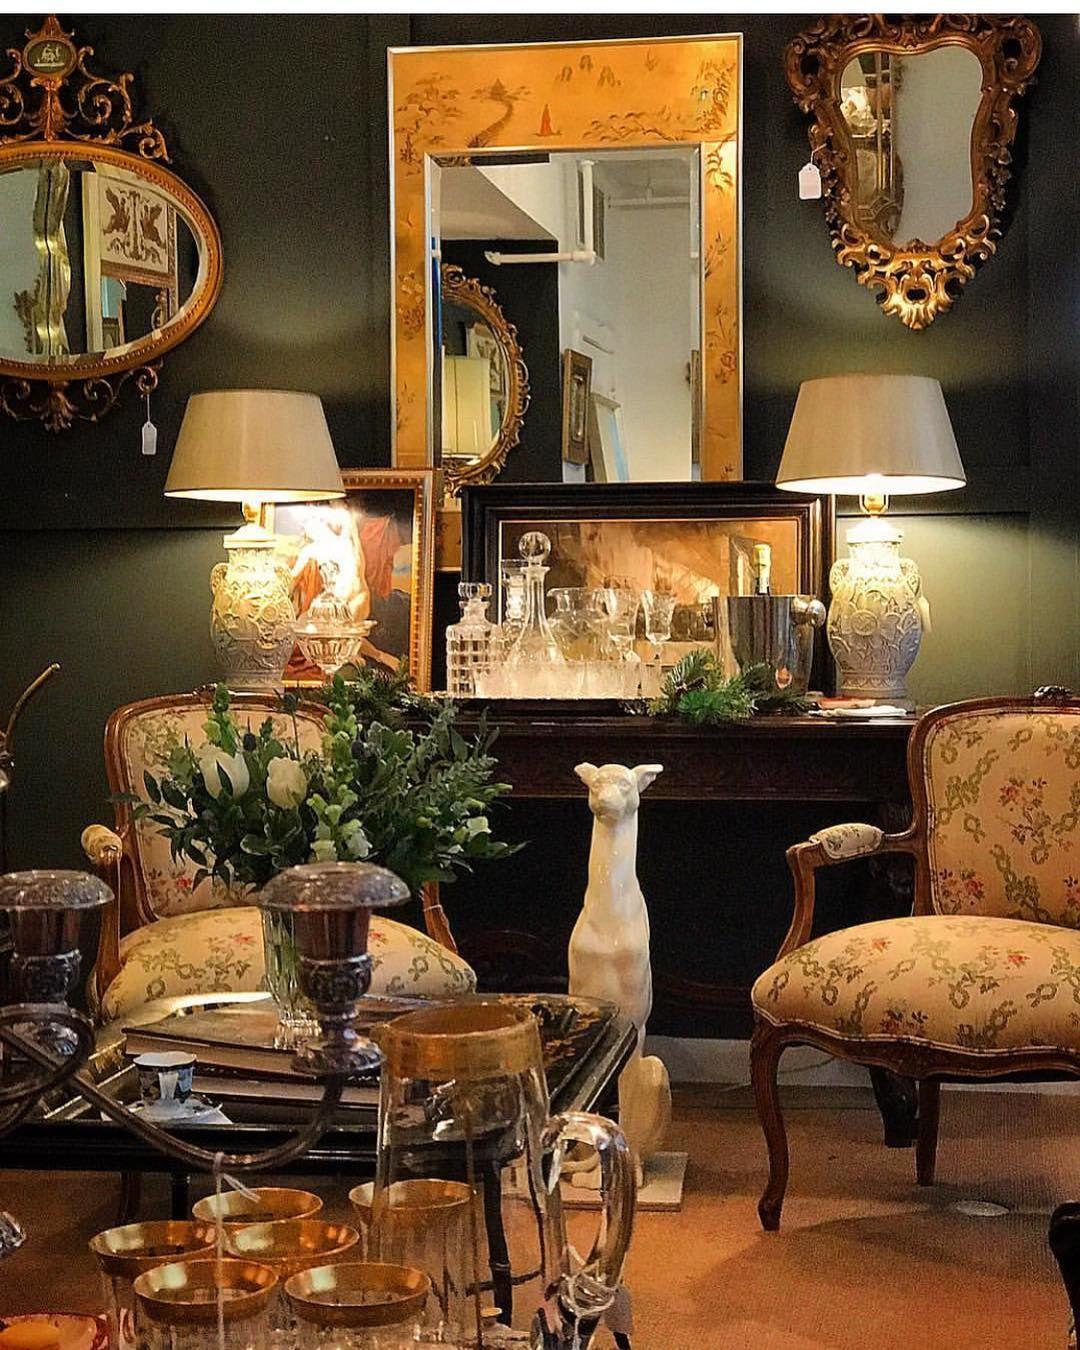 Timeless Design Schefferinteriors Itsforever Antiquelovers Timelessdesign Porcel Dining Room Decor Traditional Home Decor English Decor